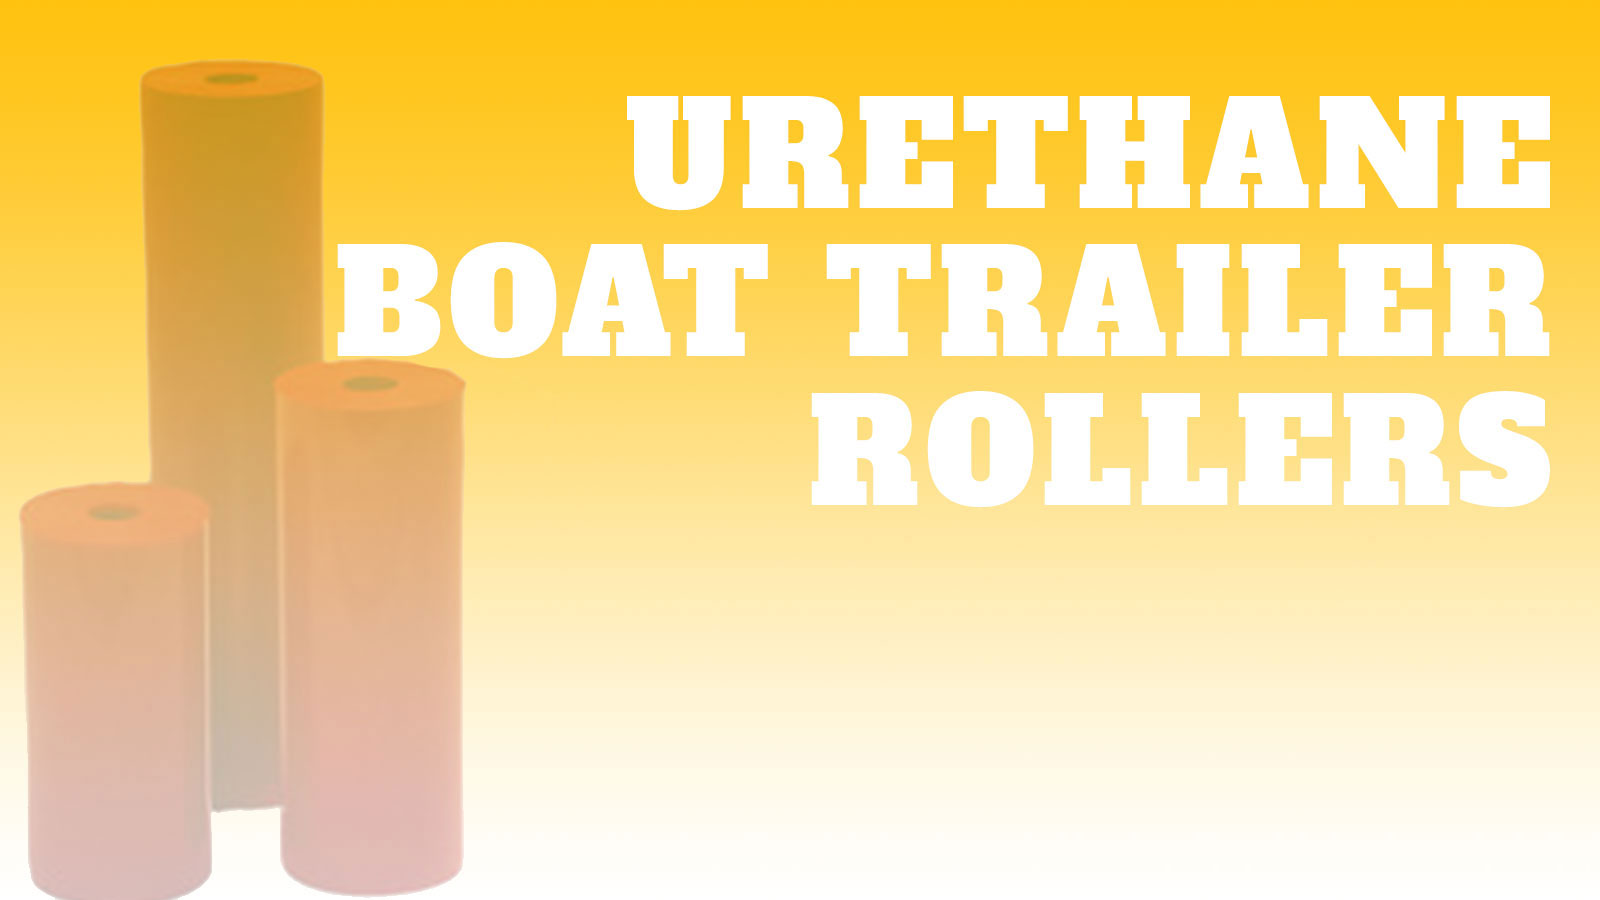 Trailer-Urethane-Boat